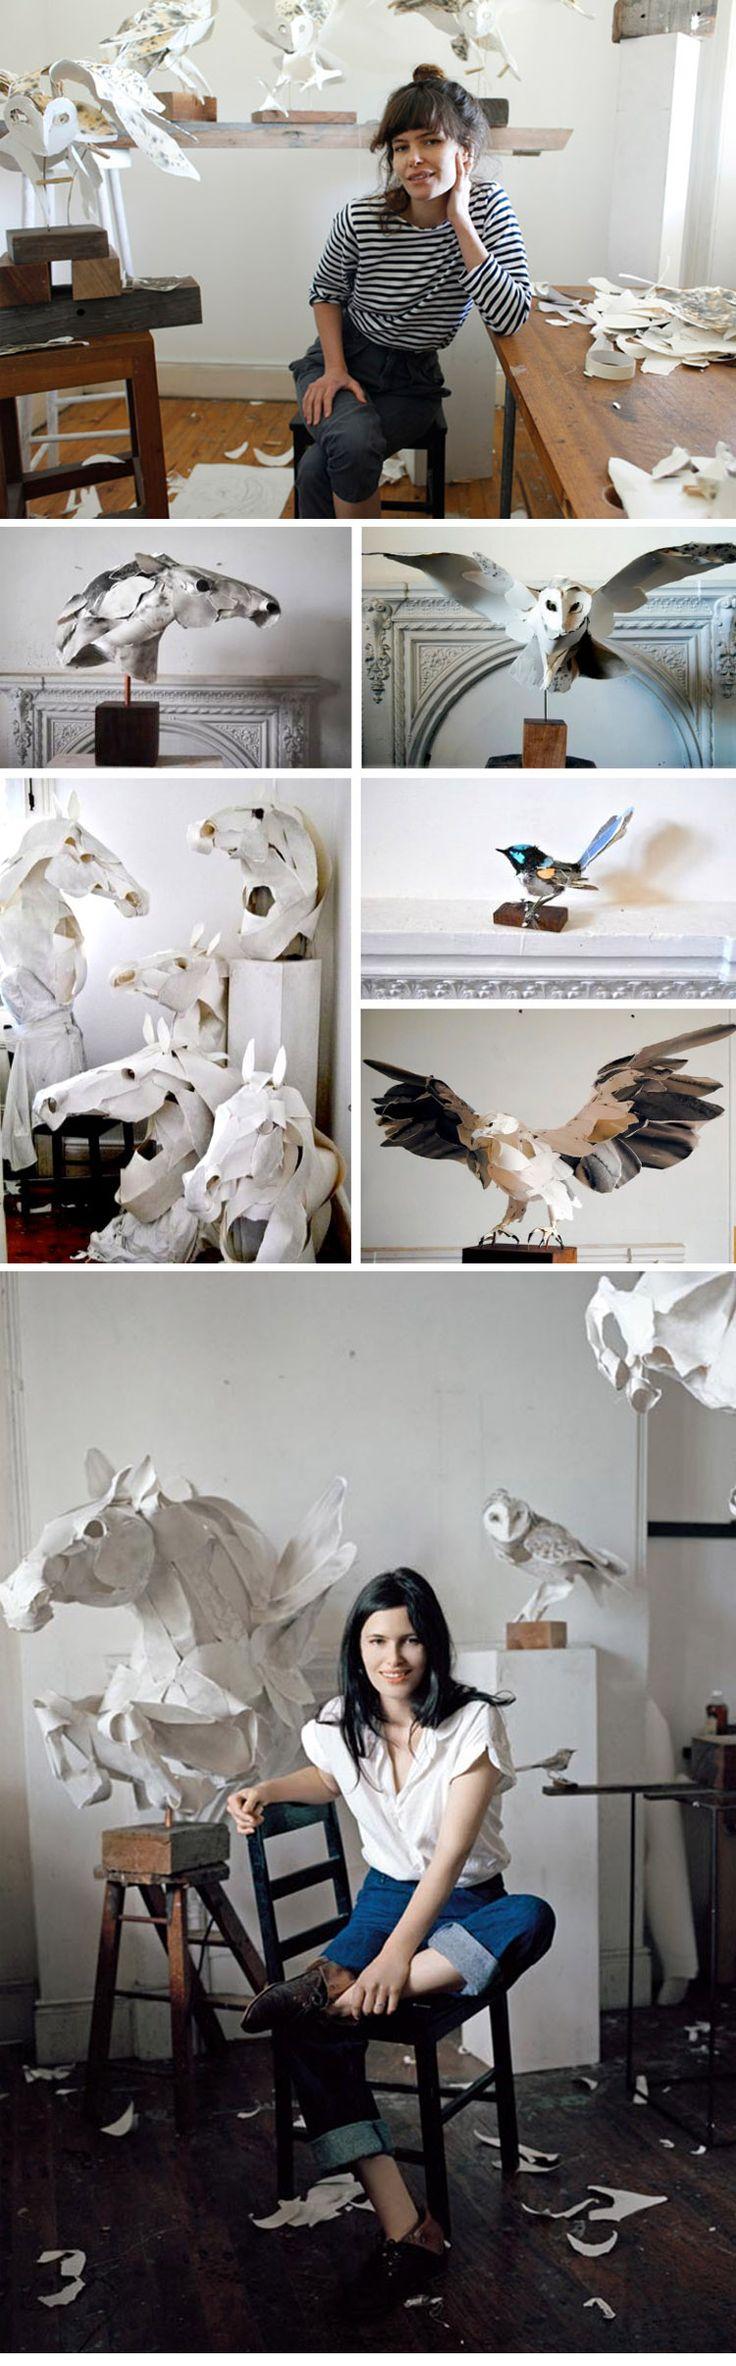 Anna-Wili Highfield in her art studio #workspace of animal paper sculptures.